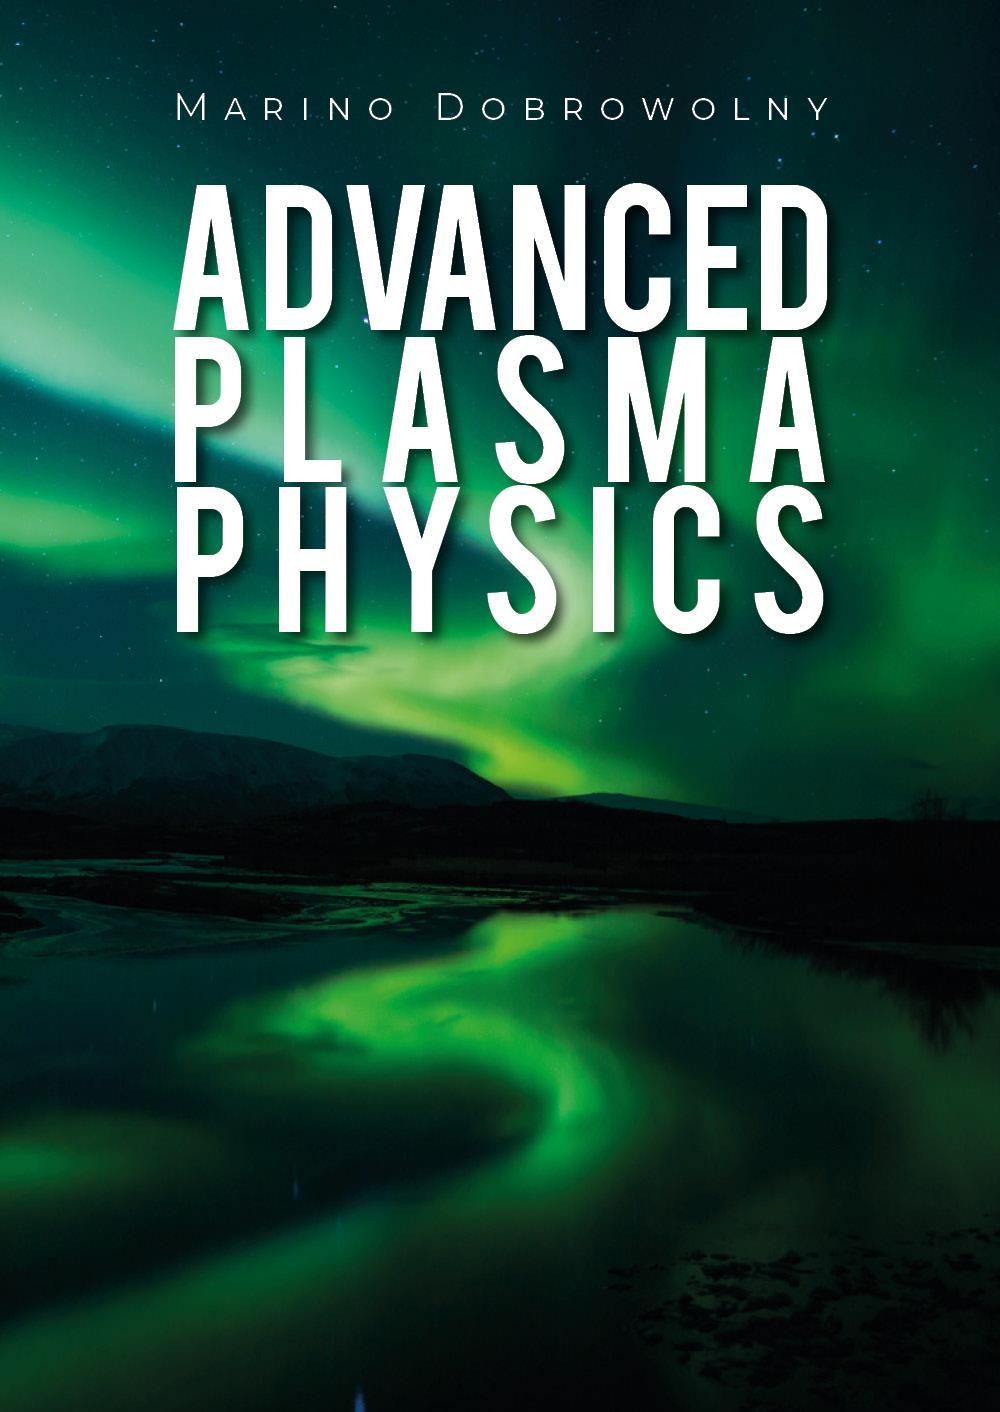 Advanced plasma physics